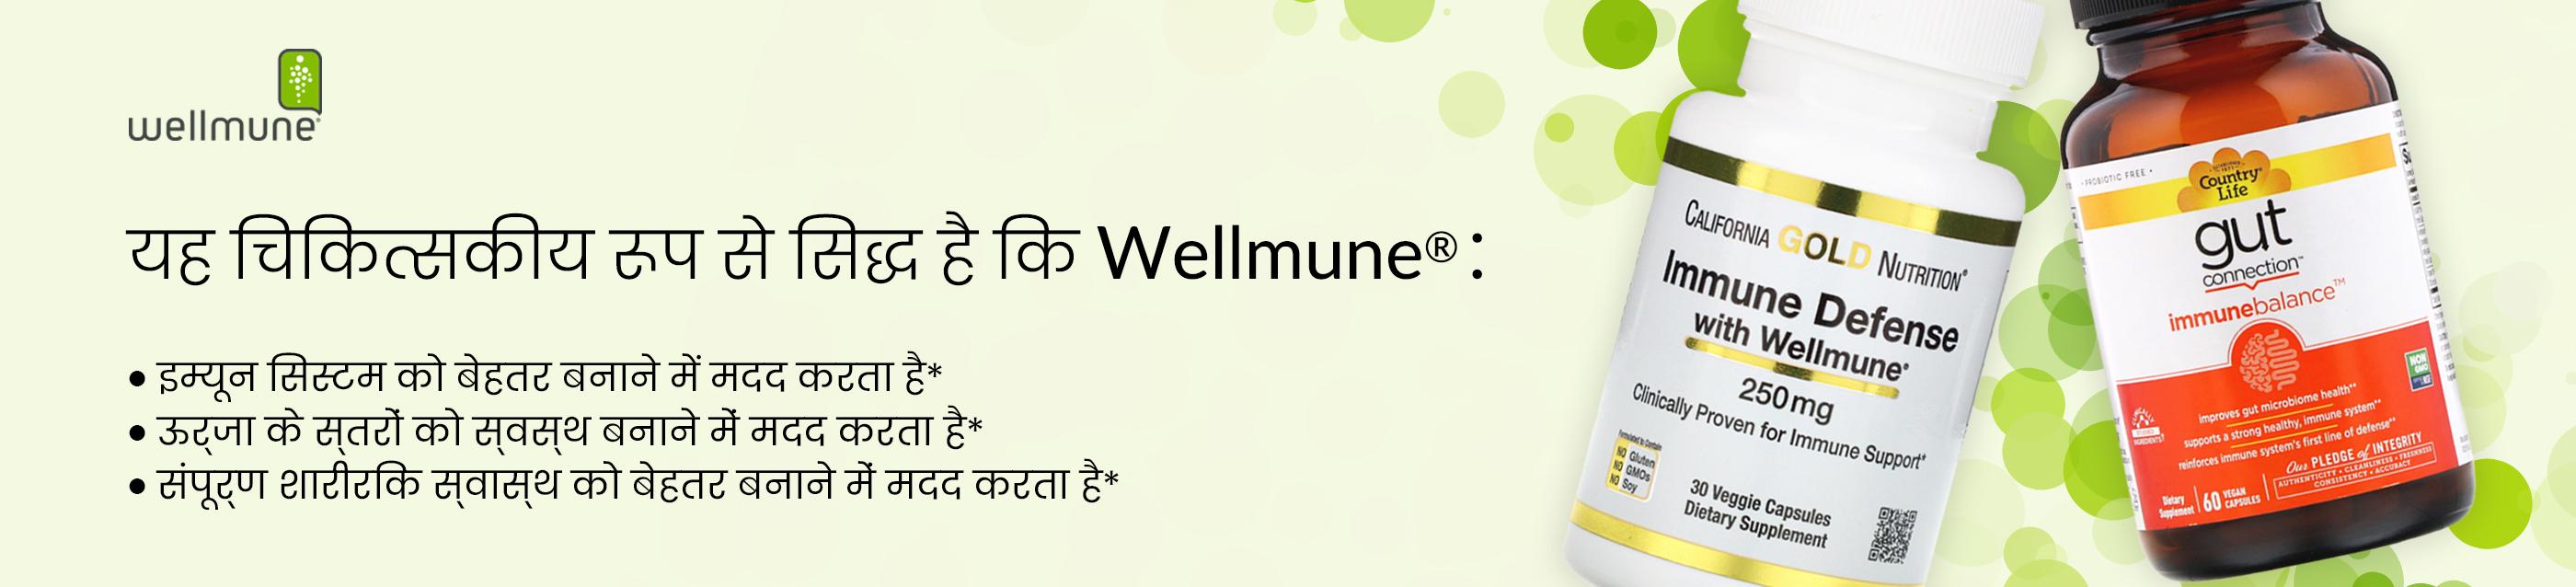 Wellmune on iHerb